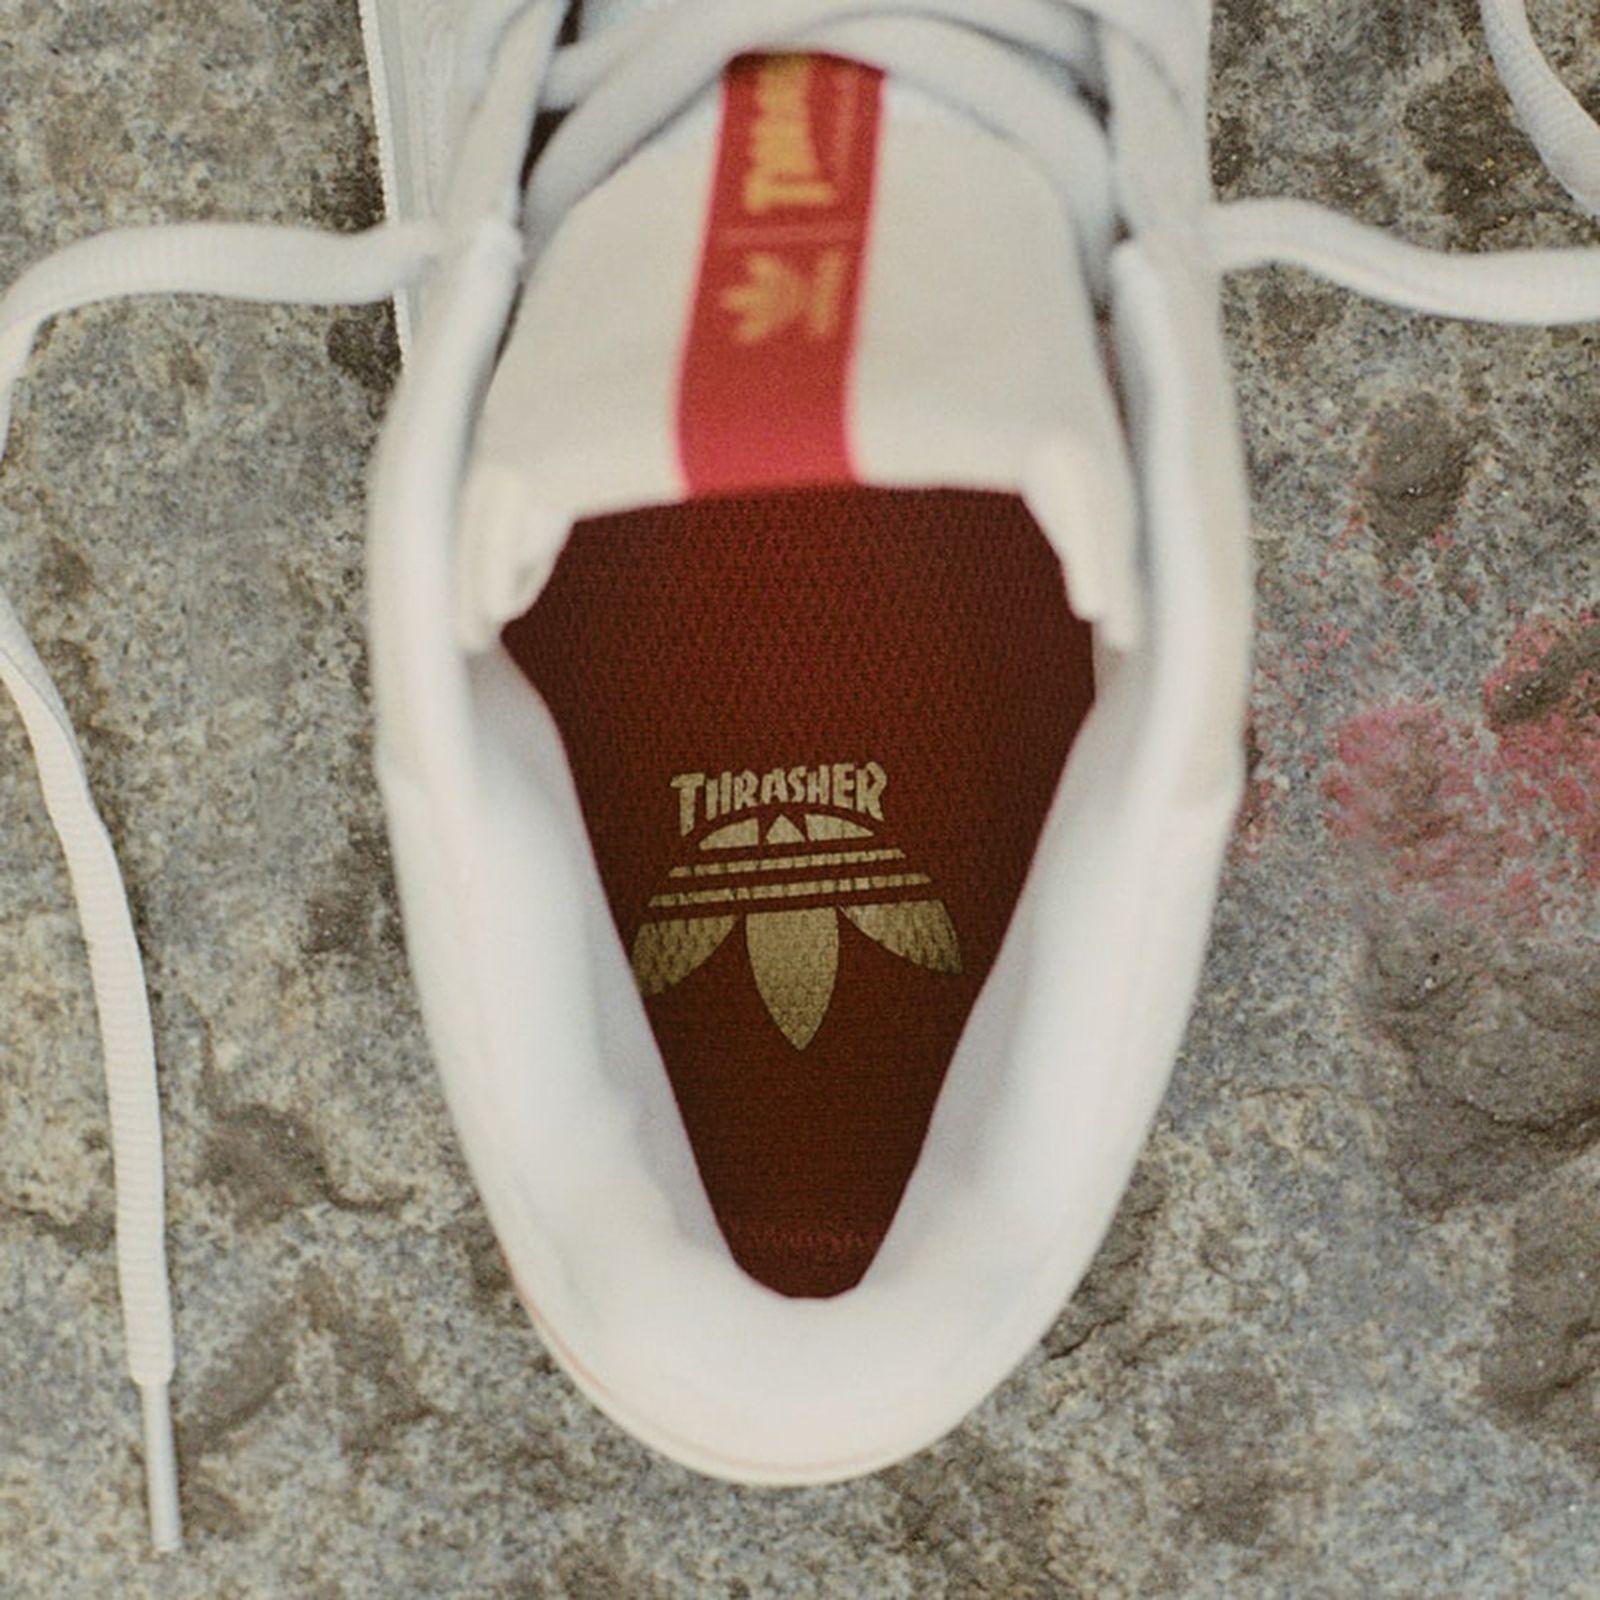 thrasher-adidas-superstar-adv-tyshawn-jones-release-date-price-06